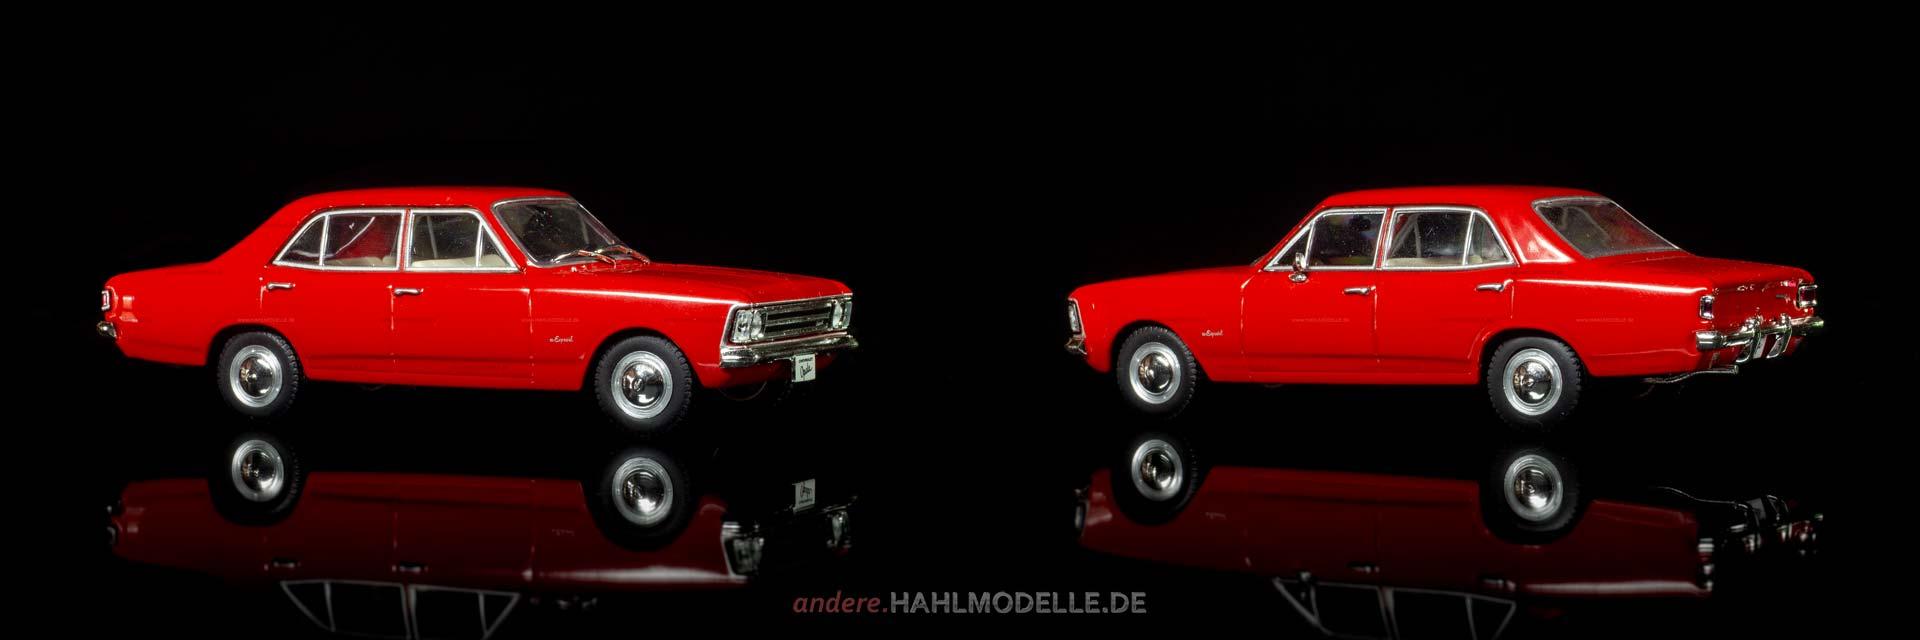 Chevrolet Opala | Limousine | Ixo (Opel Collection von Eaglemoss) | 1:43 | www.andere.hahlmodelle.de